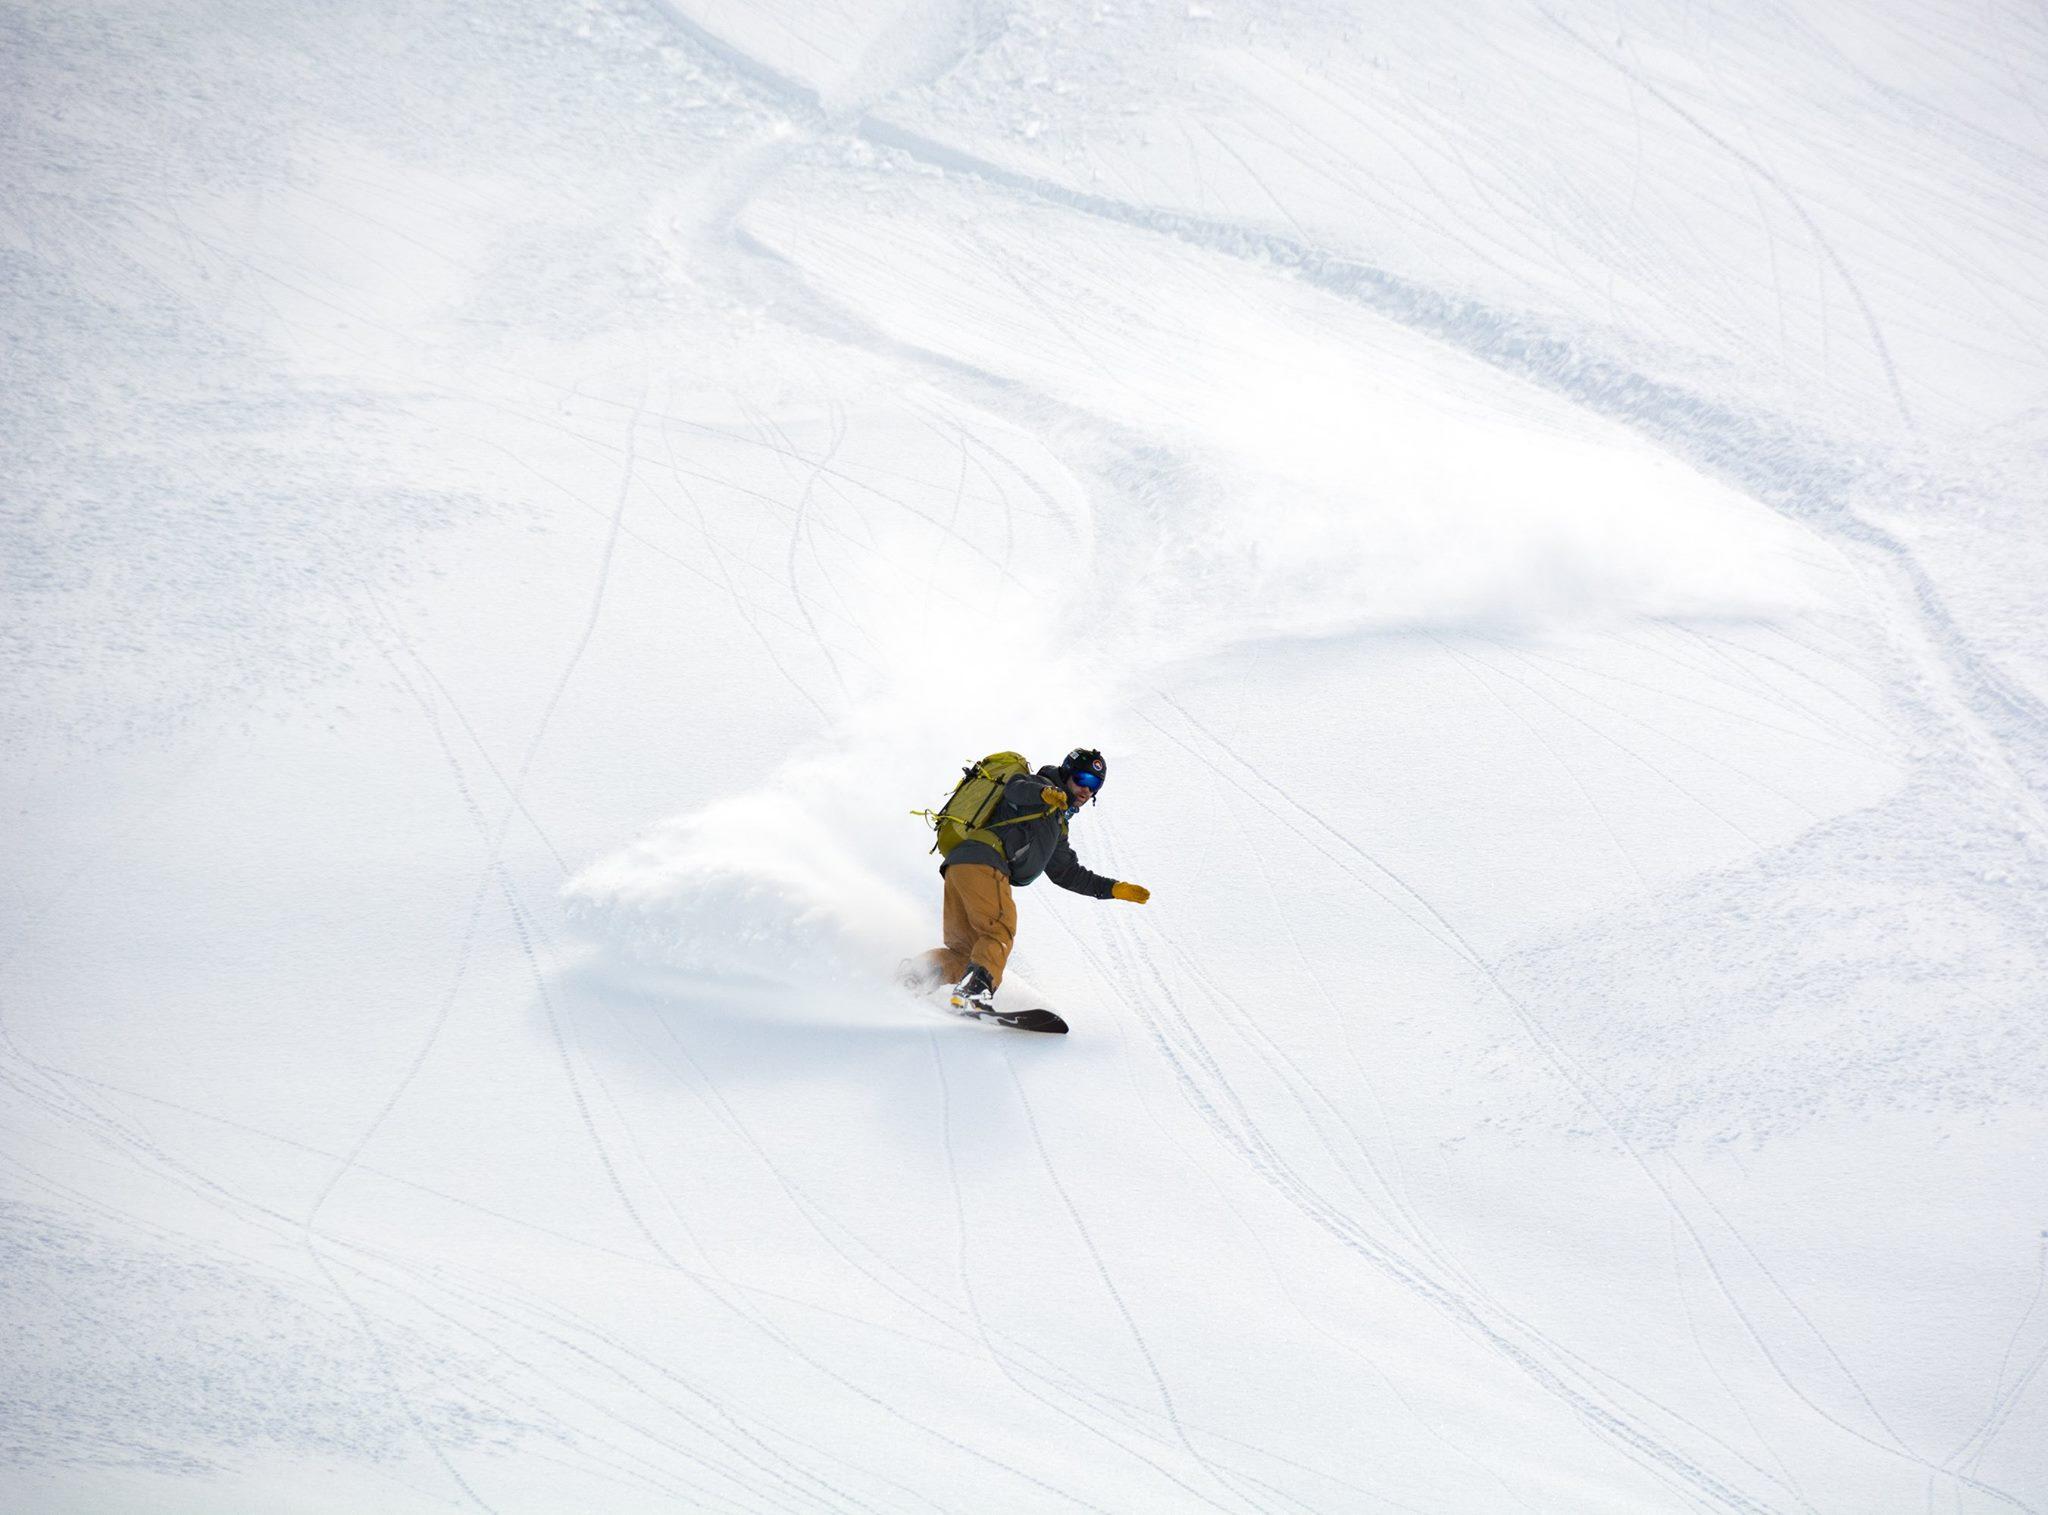 Shredding some Mt Baker Pow (pic courtesy of Zach Birmingham)